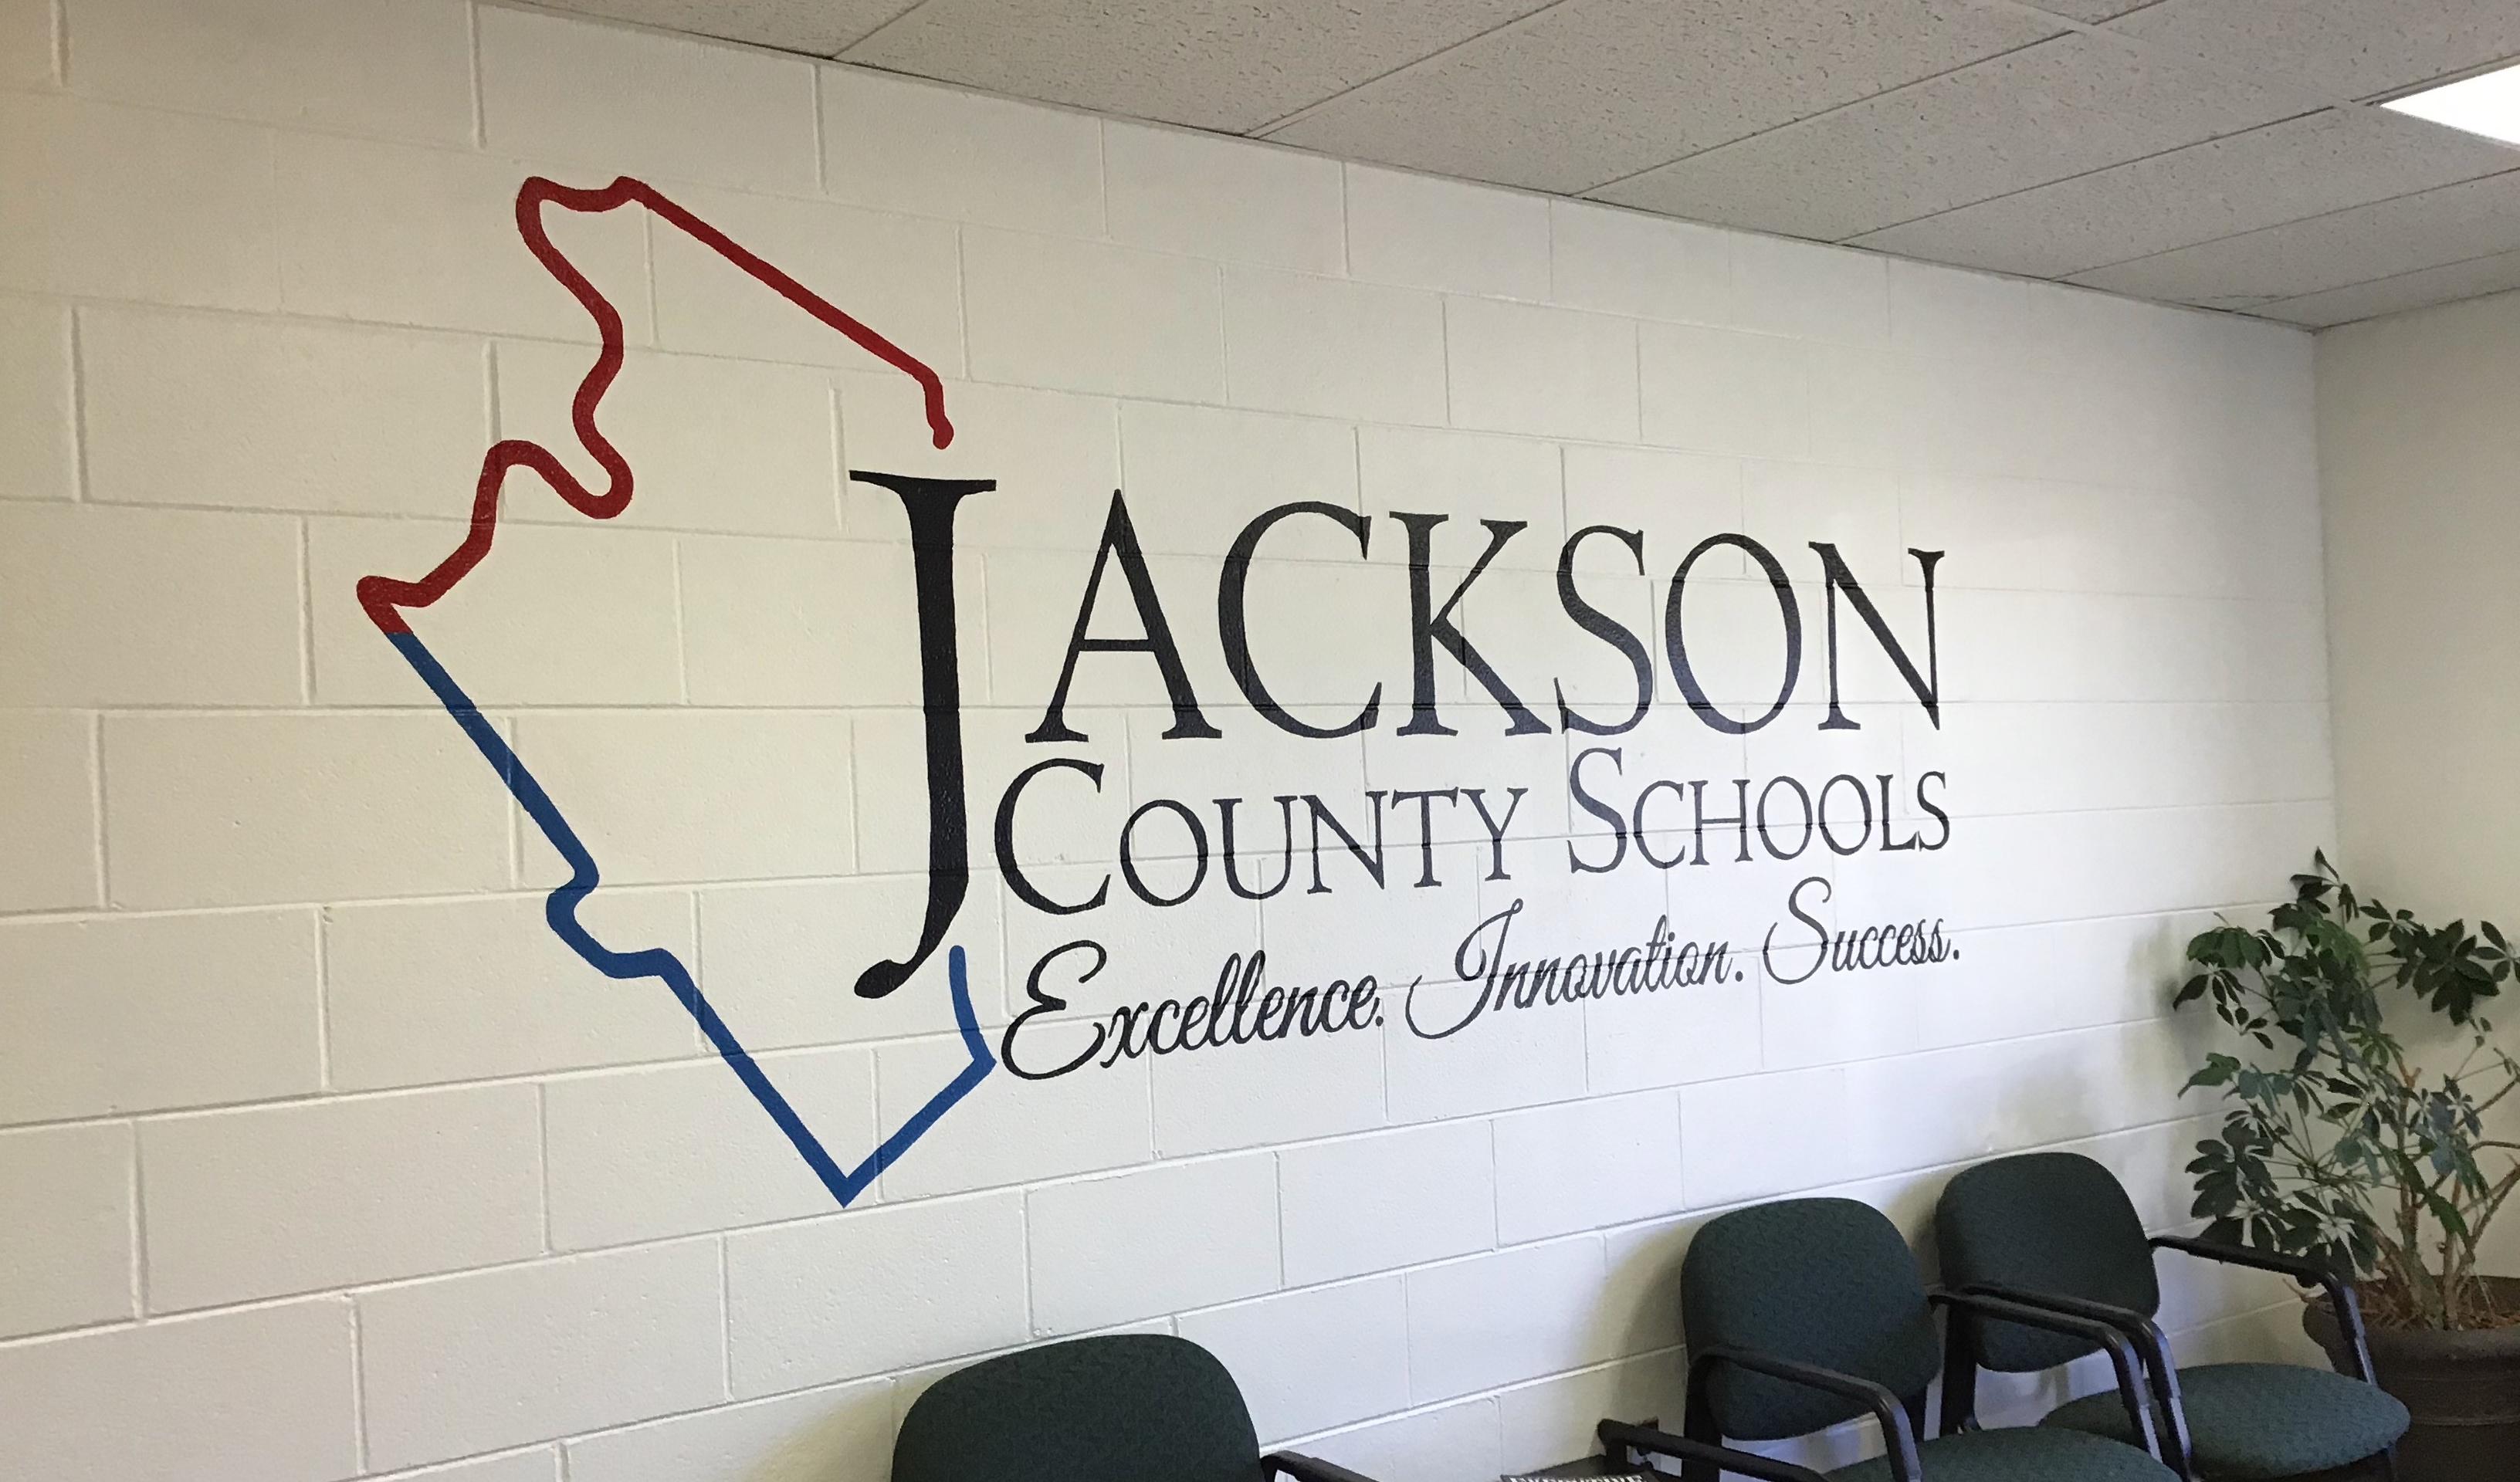 Jackson County Schools Logo on the wall